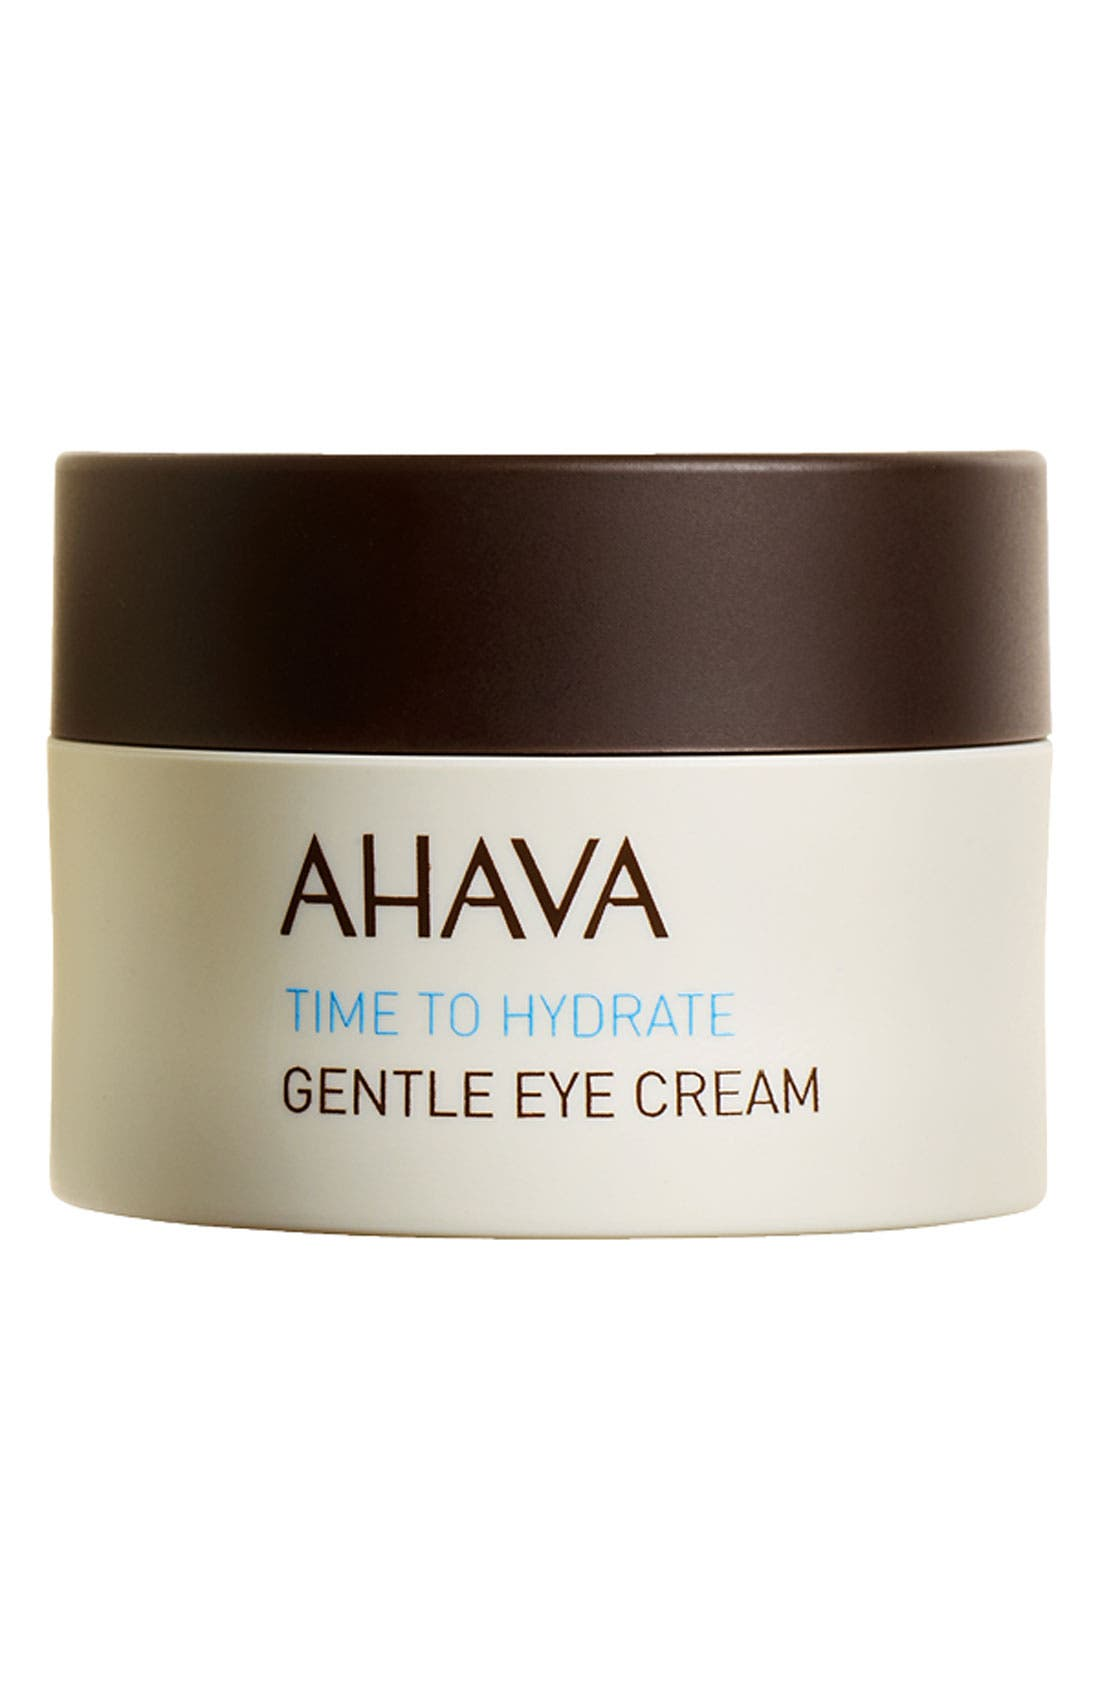 AHAVA 'Time to Hydrate' Gentle Eye Cream